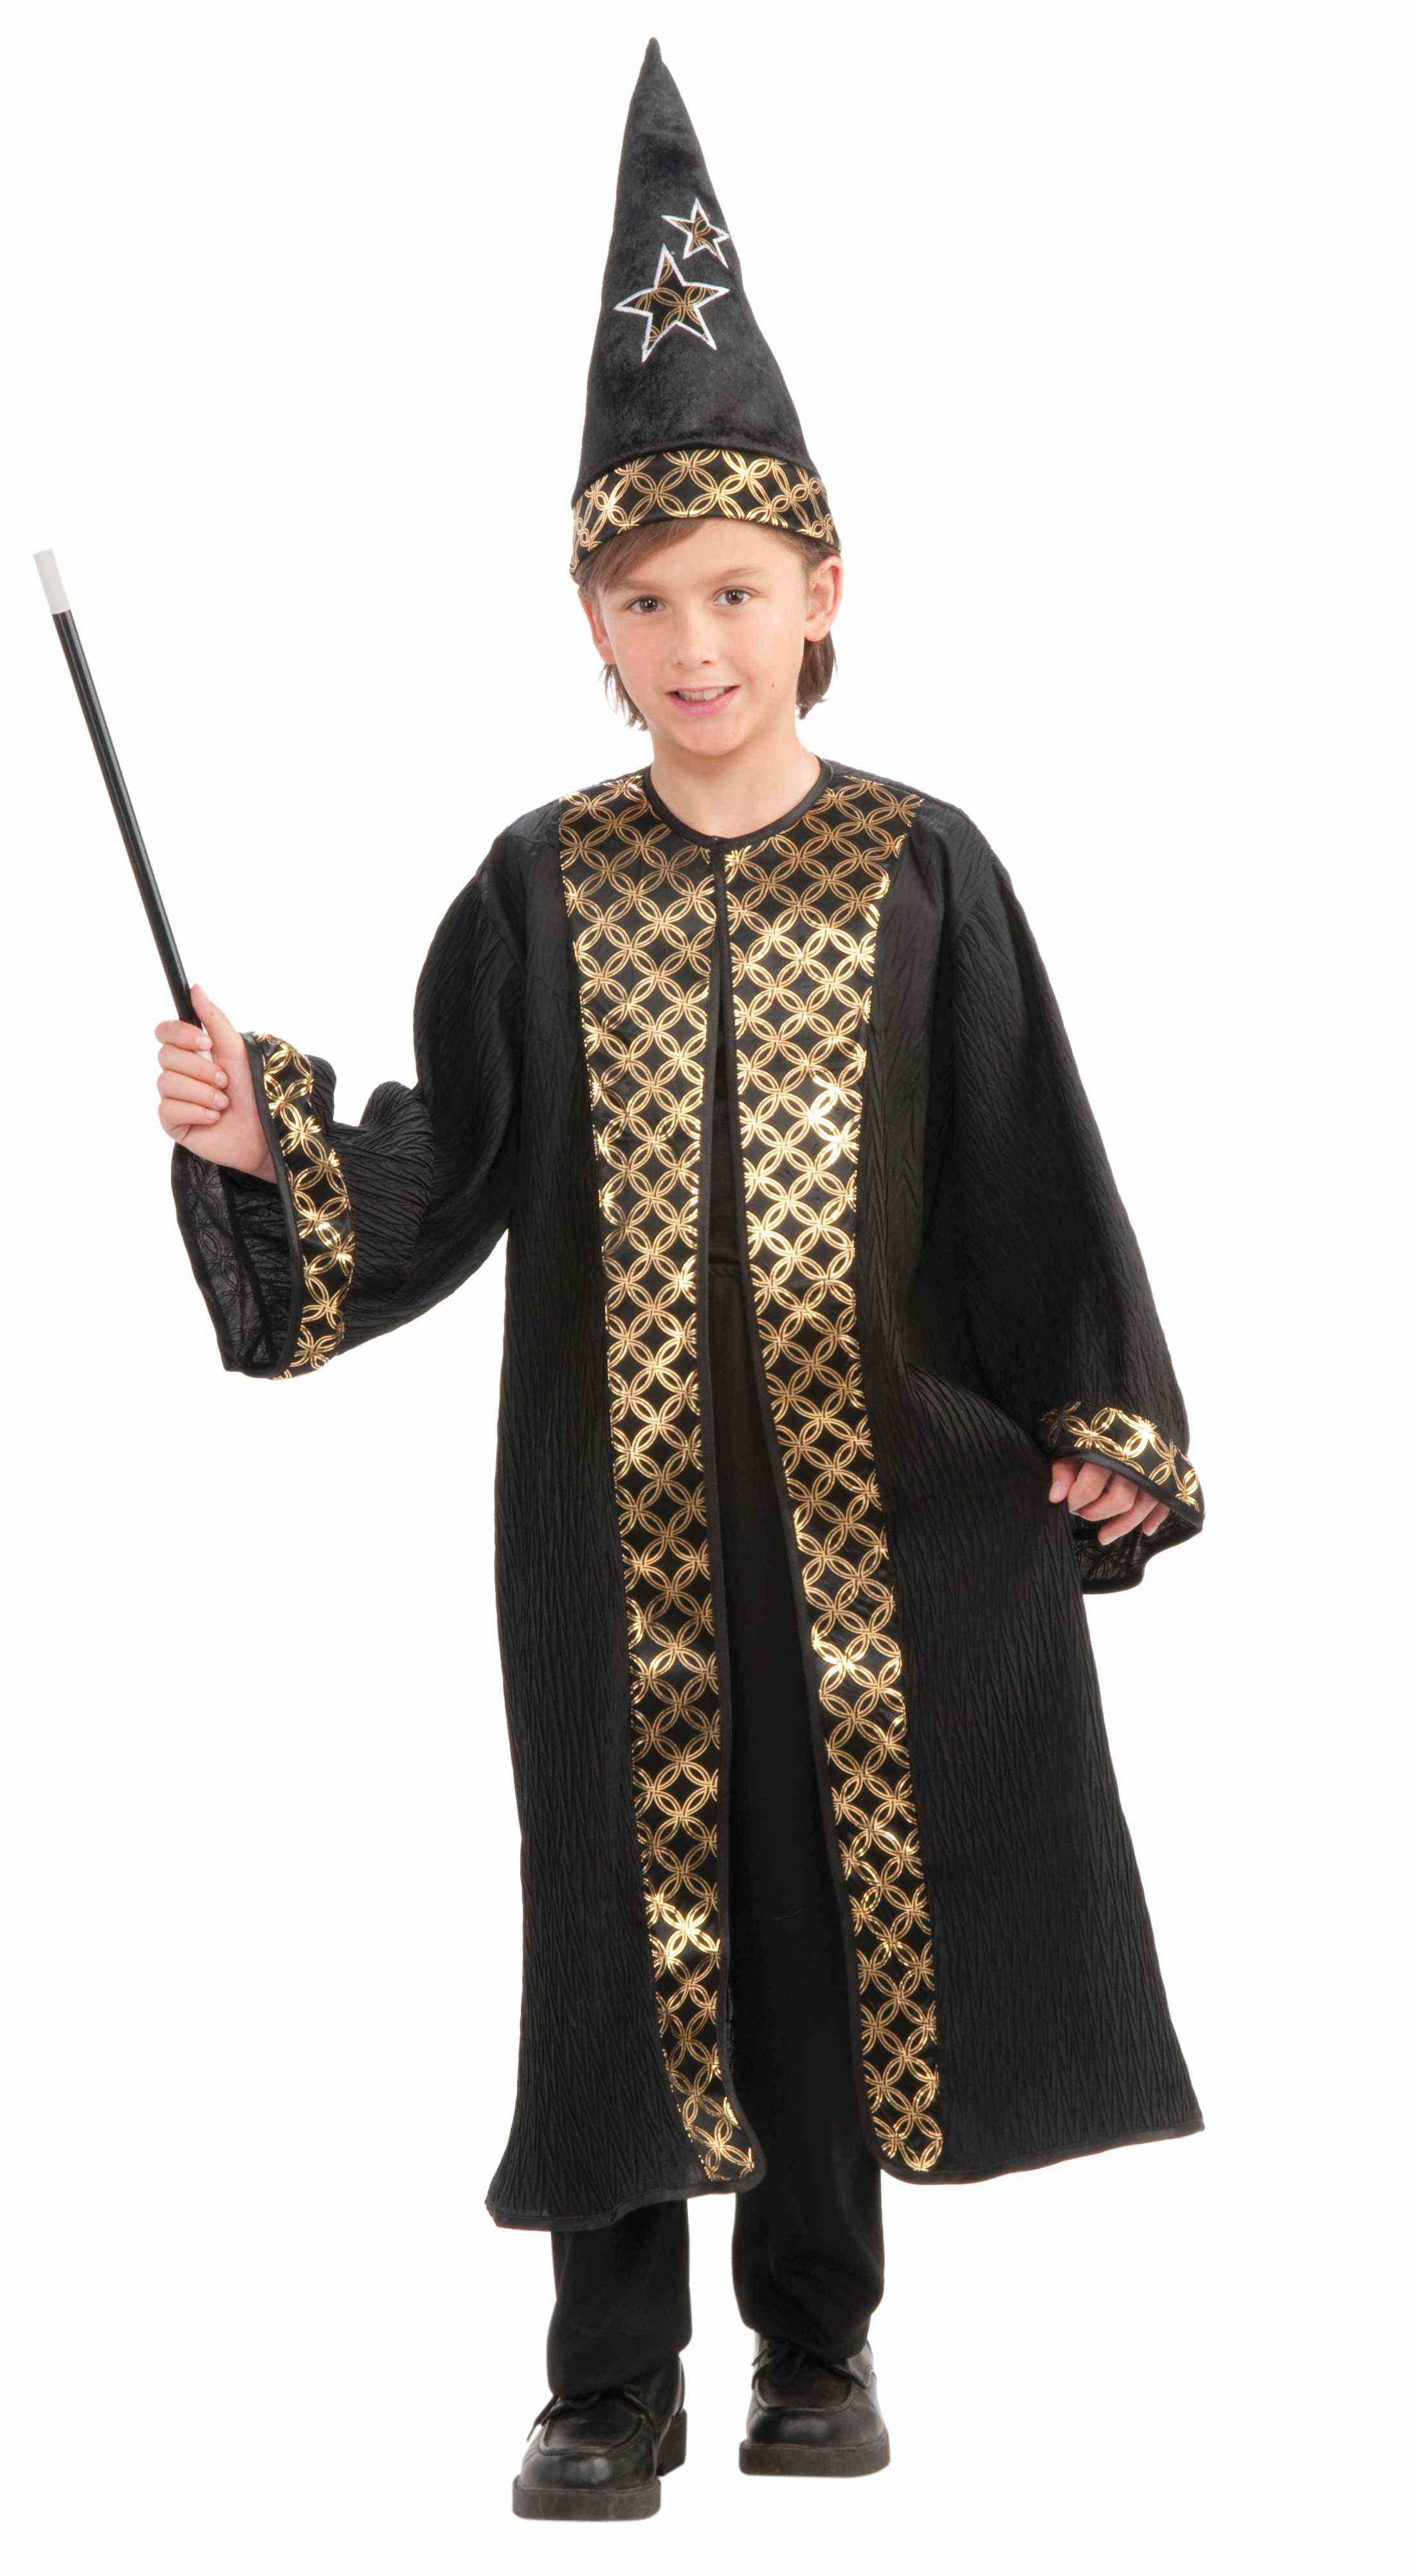 Костюм маленького колдуна (32-38) -  Ведьмы и колдуны